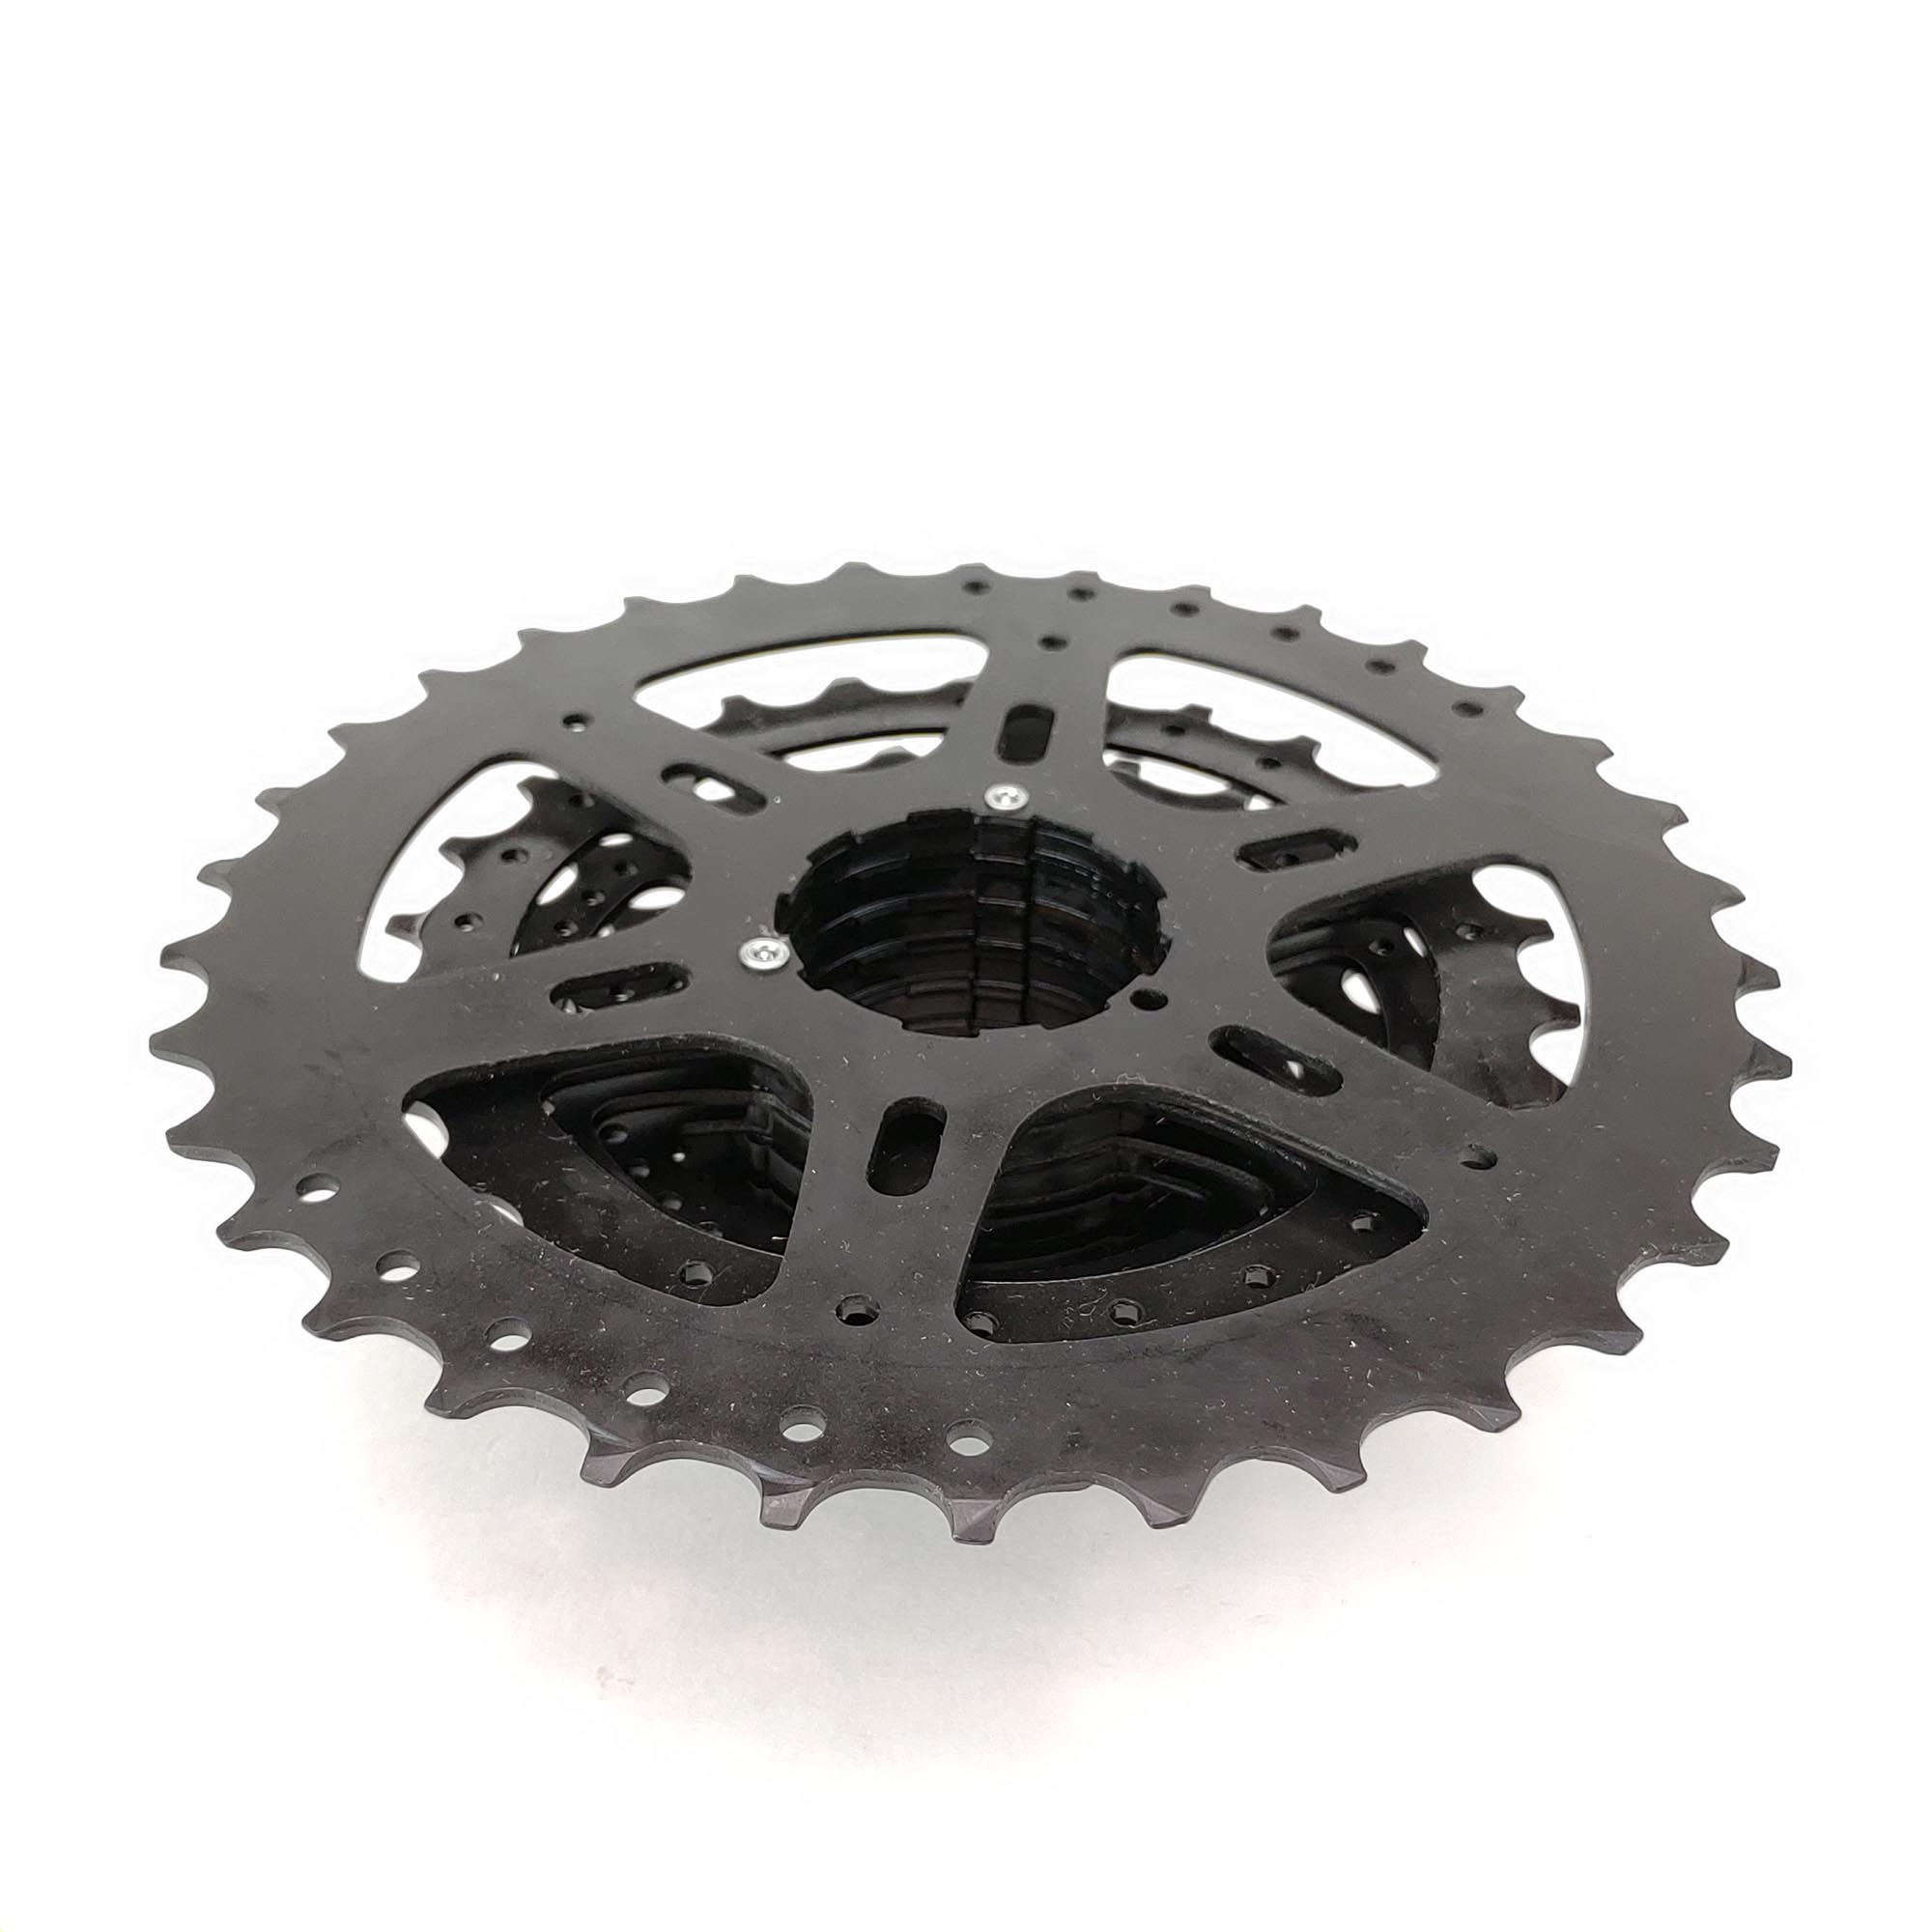 Cassete Bike de 8 velocidades Shimano Hg-31 11-34D Megarange